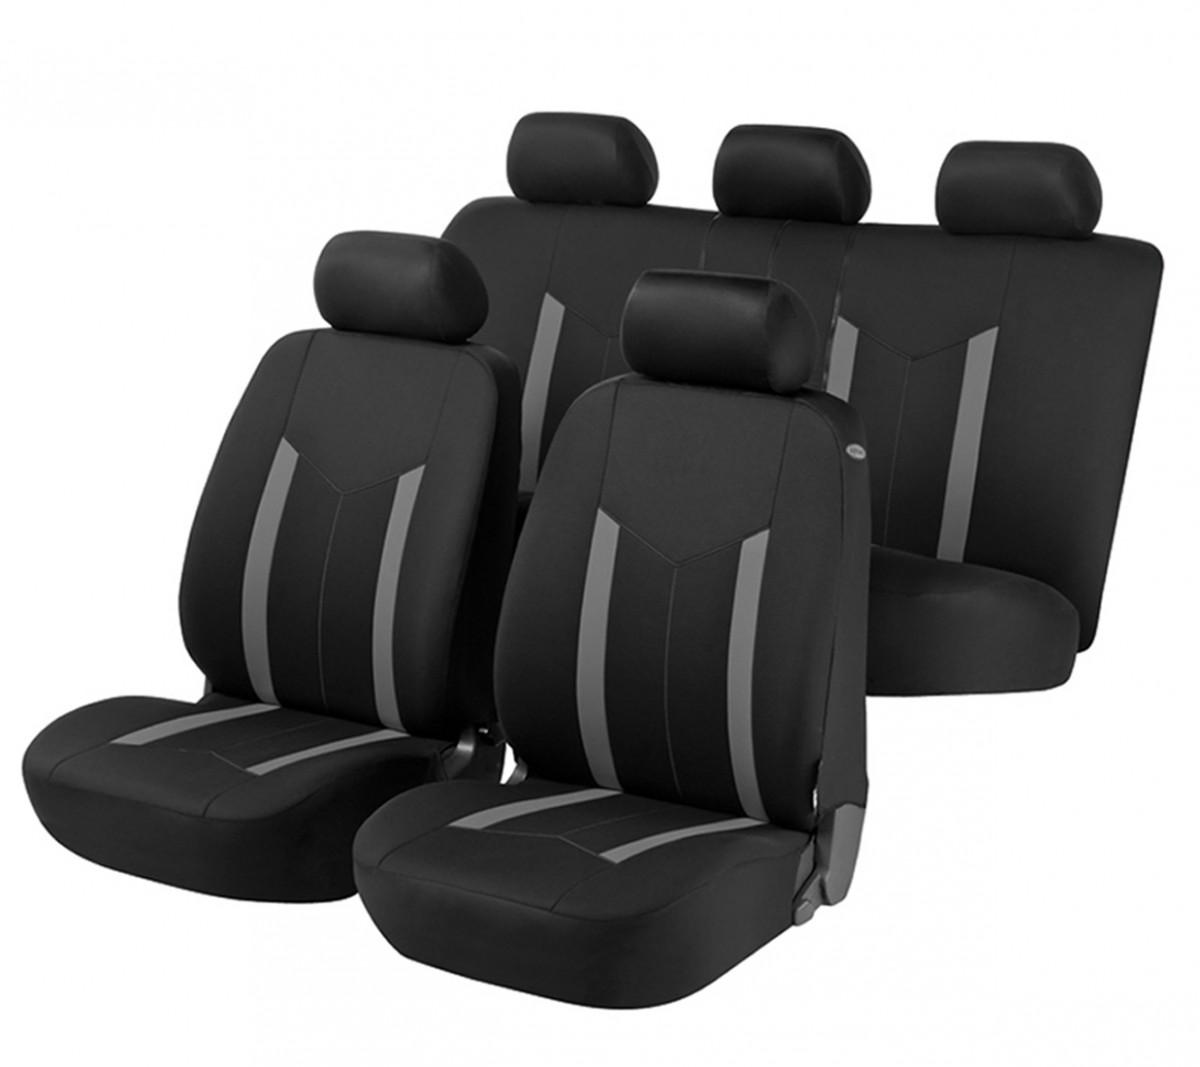 autositzbezug schonbezug komplett set nissan micra schwarz grau. Black Bedroom Furniture Sets. Home Design Ideas